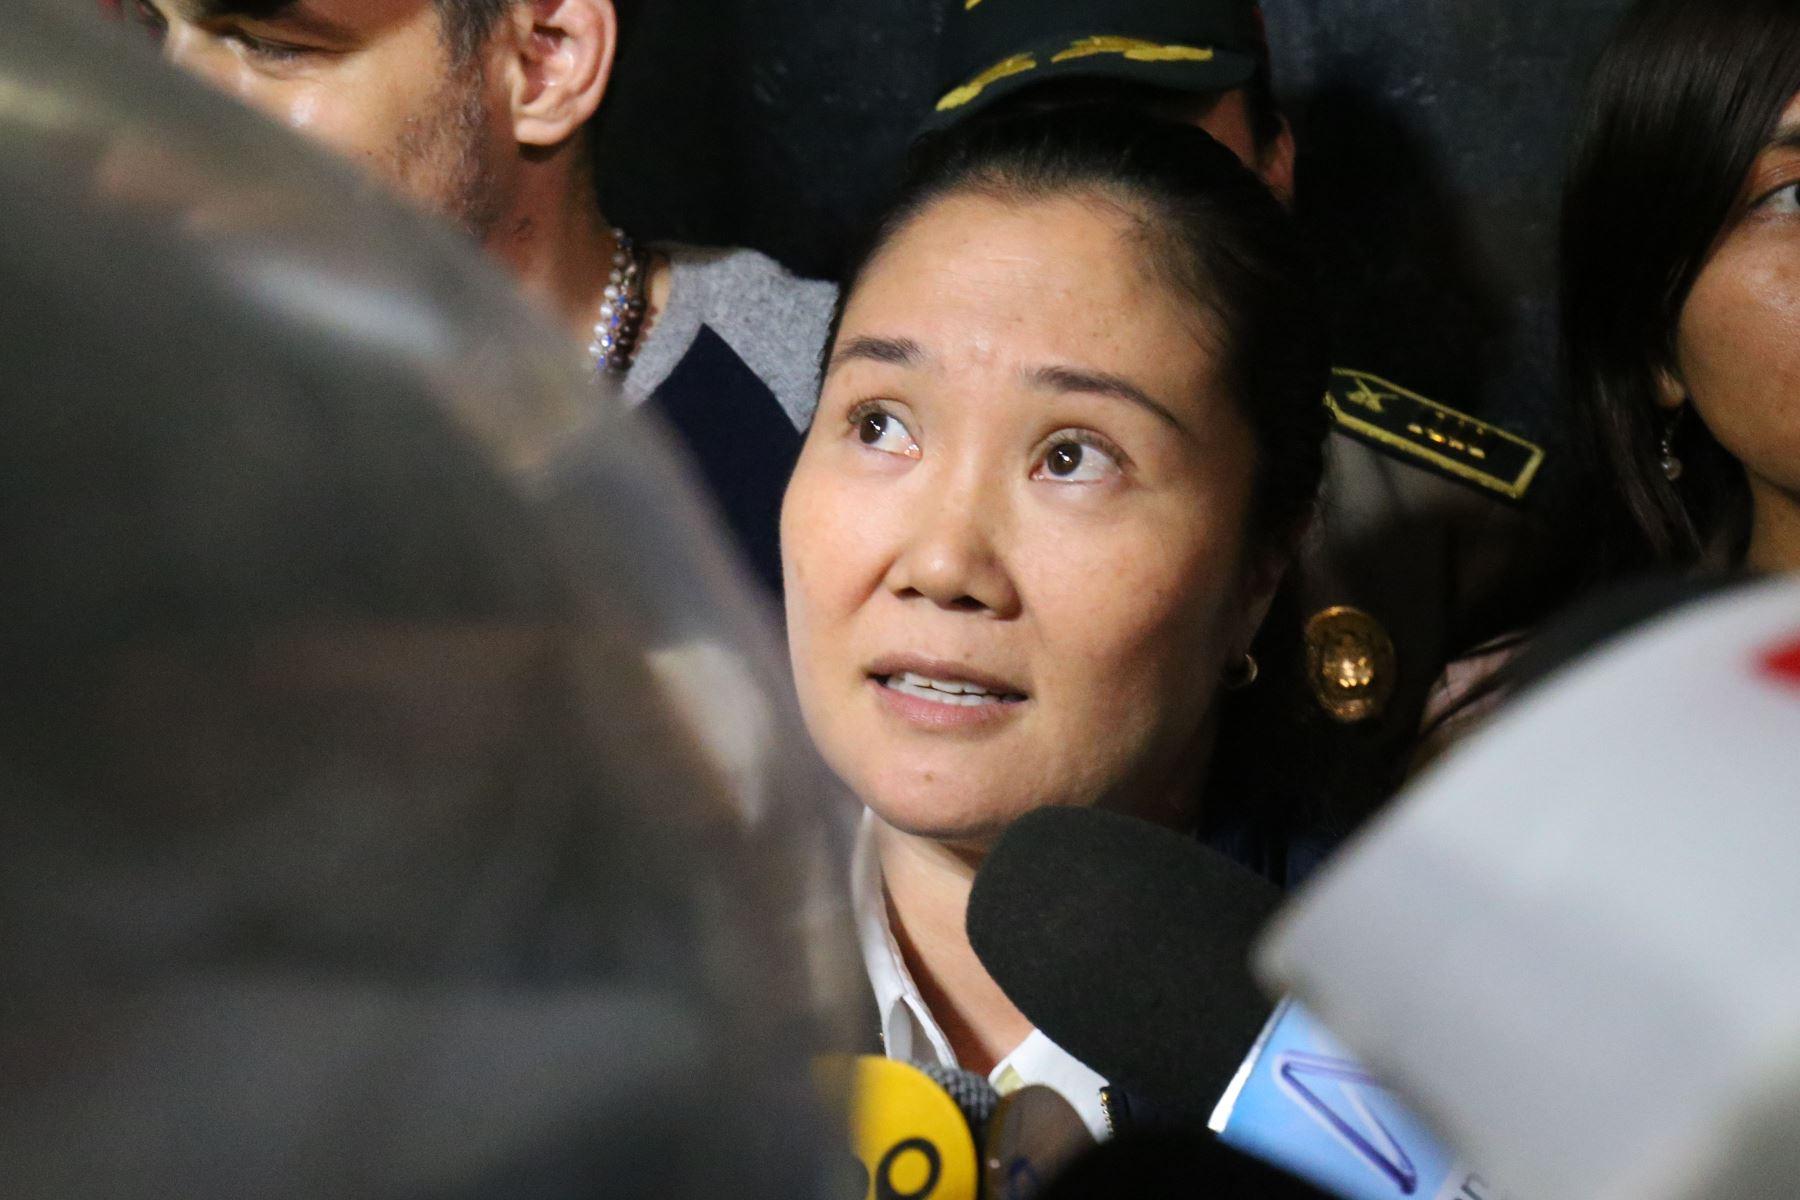 Keiko Fujimori: Rivera dice que Fiscalía debería ir cerrando investigación (Andina)